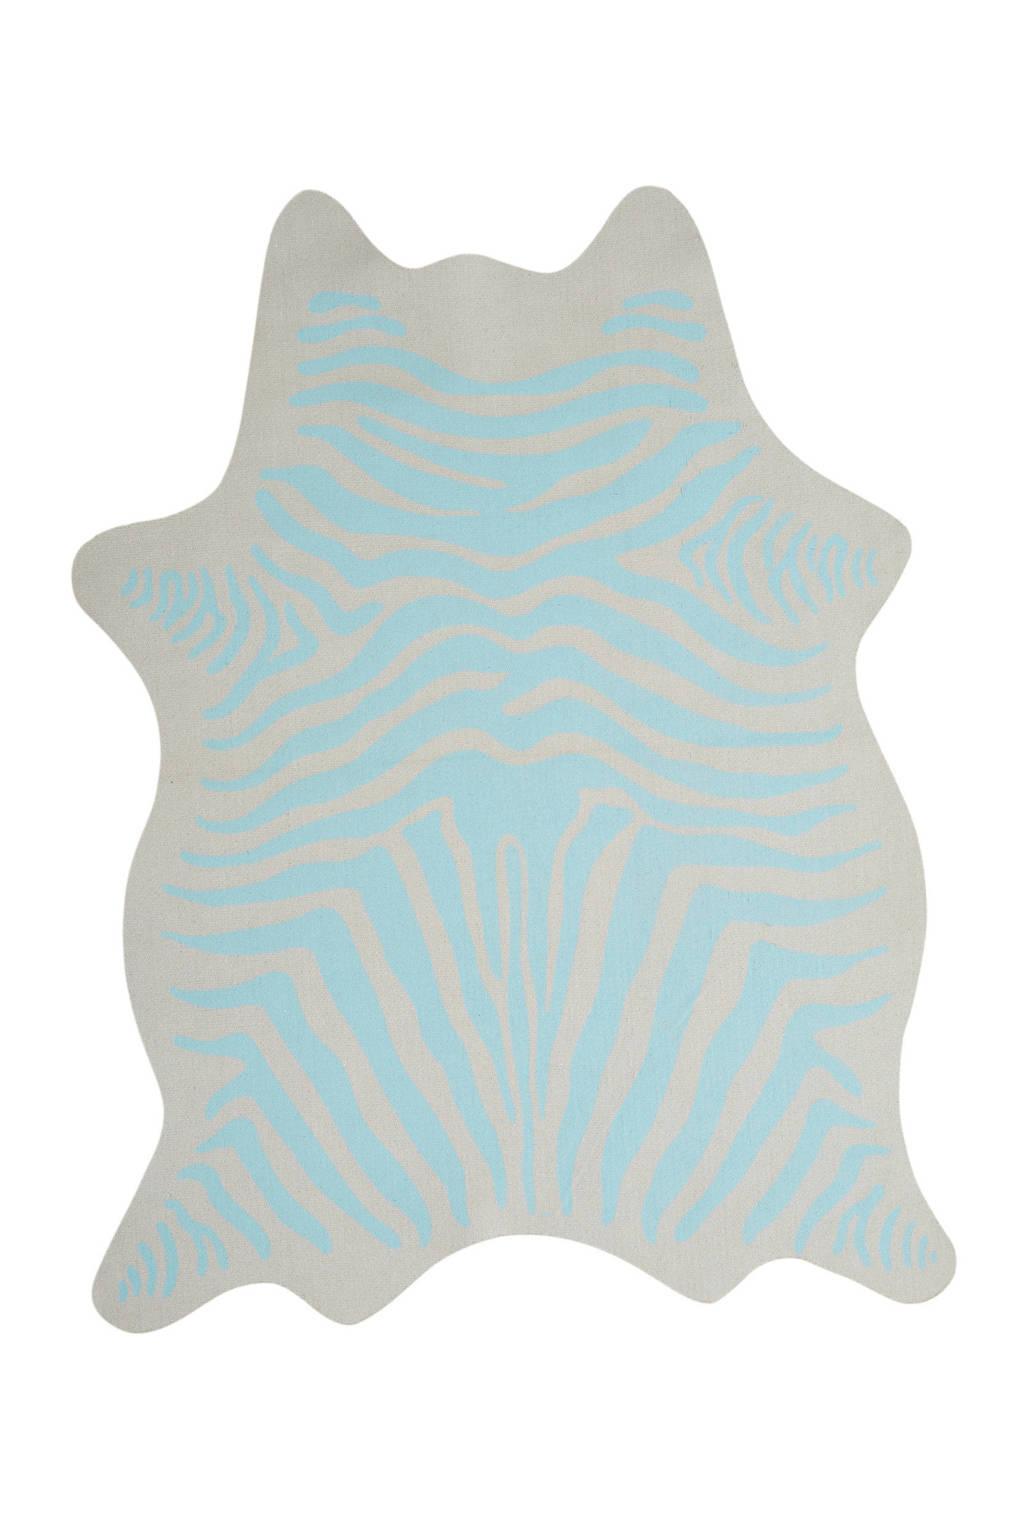 Kidsdepot vloerkleed Zebra  (120x90 cm), Blauw